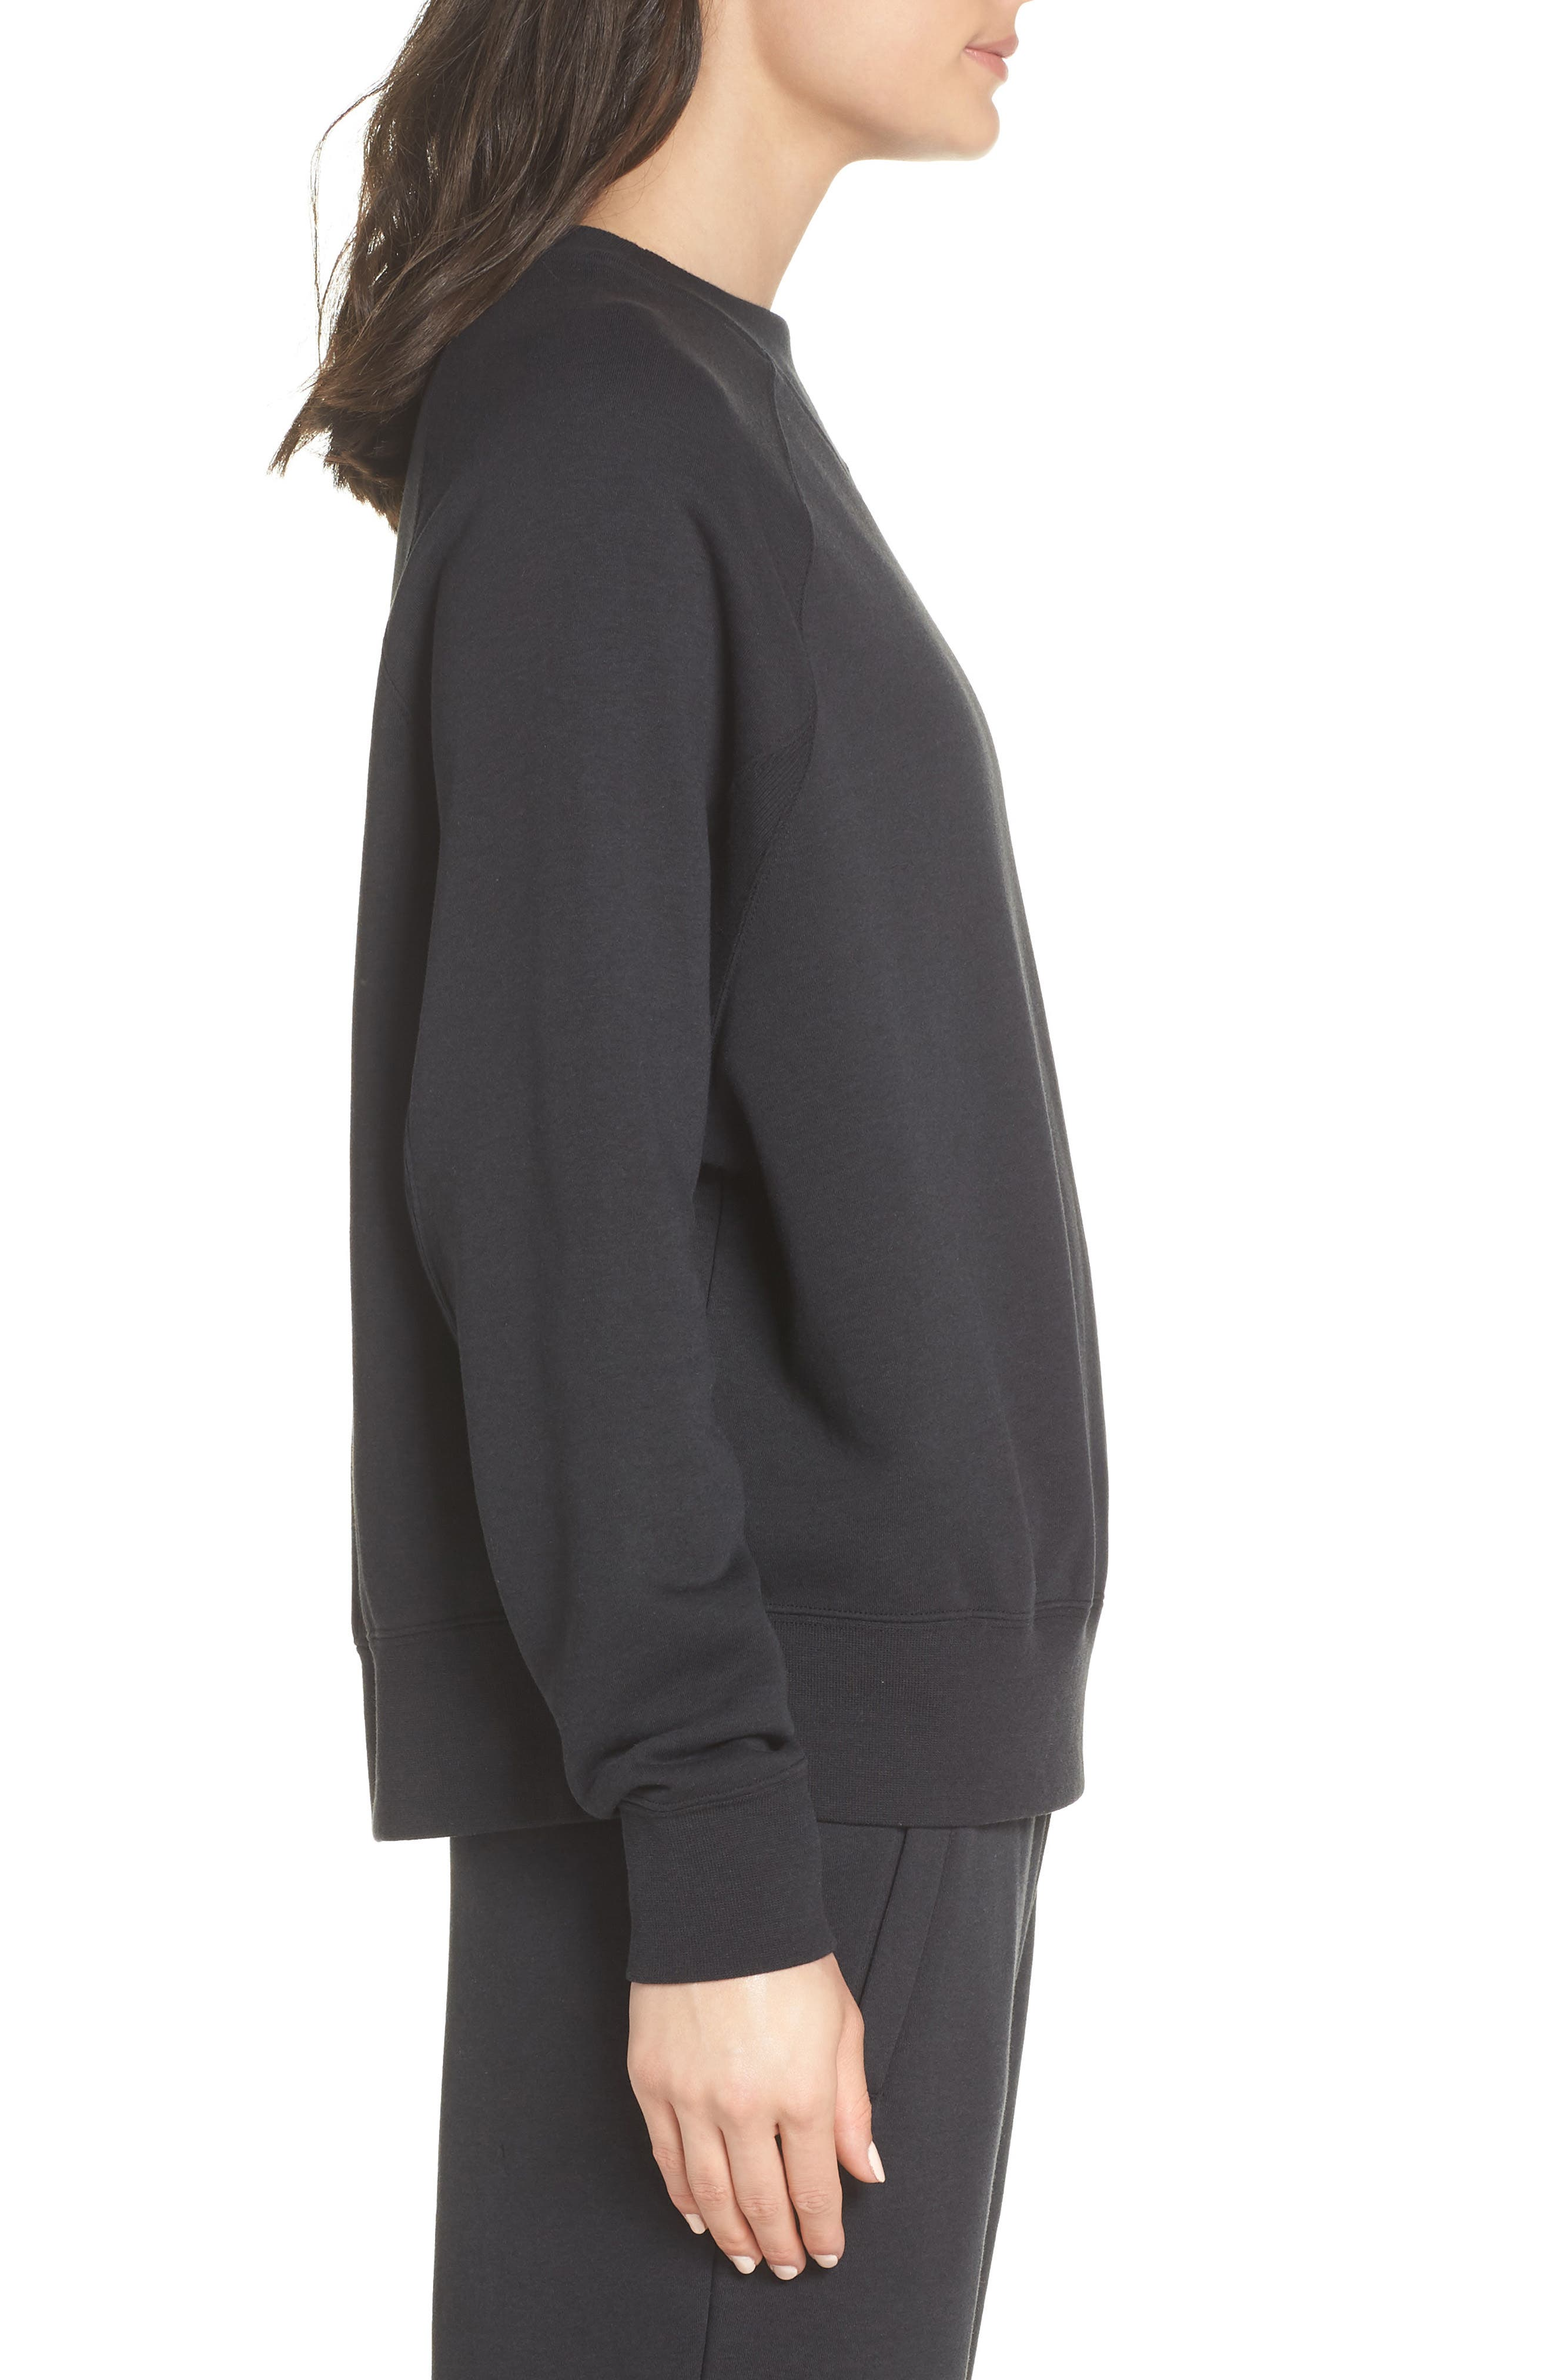 Sportswear Rally Sweatshirt,                             Alternate thumbnail 3, color,                             Black/ White